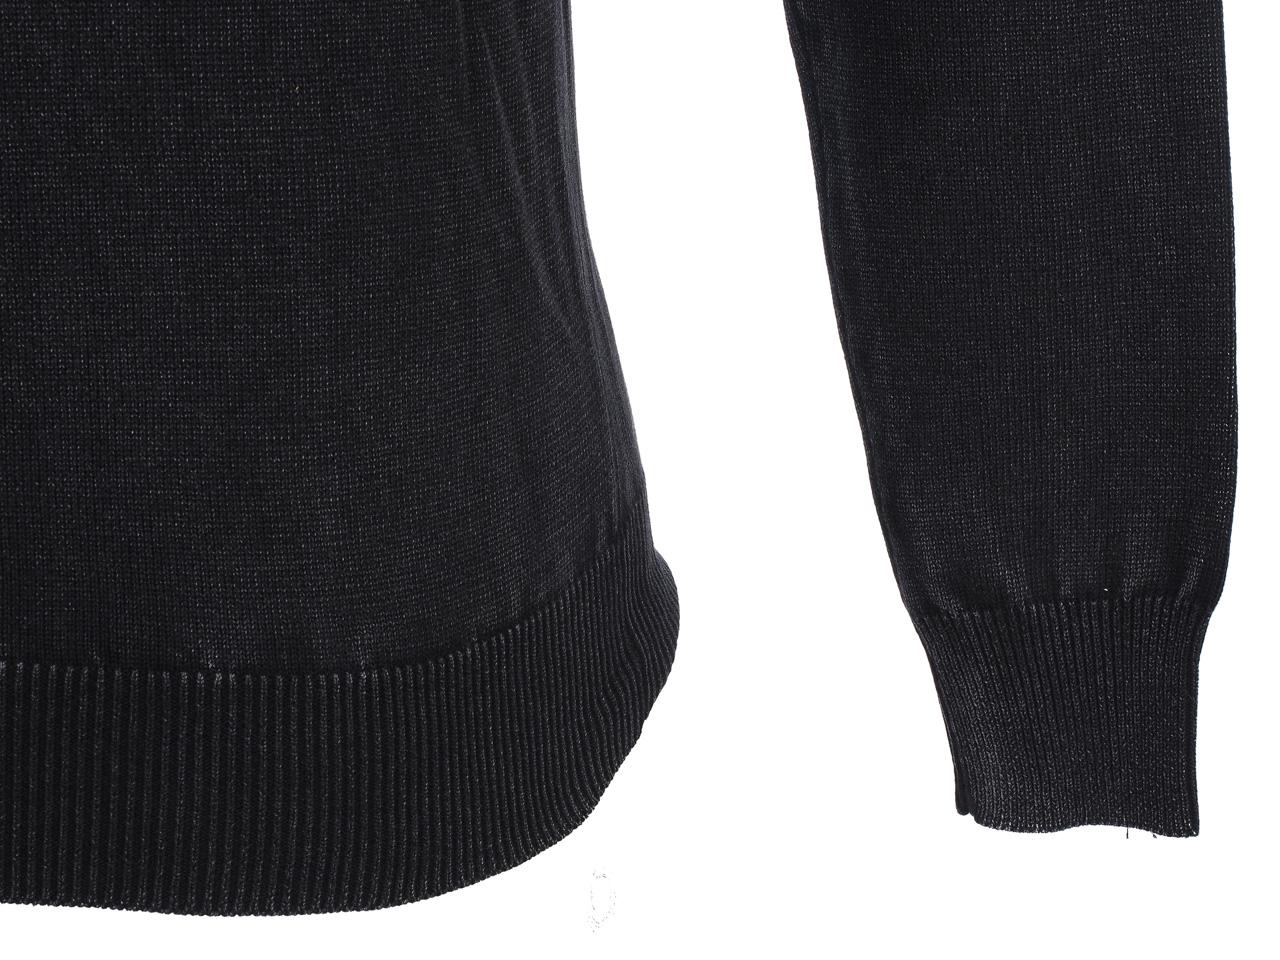 Thin-Sweater-Rivaldi-Black-Gilianu-Black-Black-Sweater-79337-New thumbnail 3